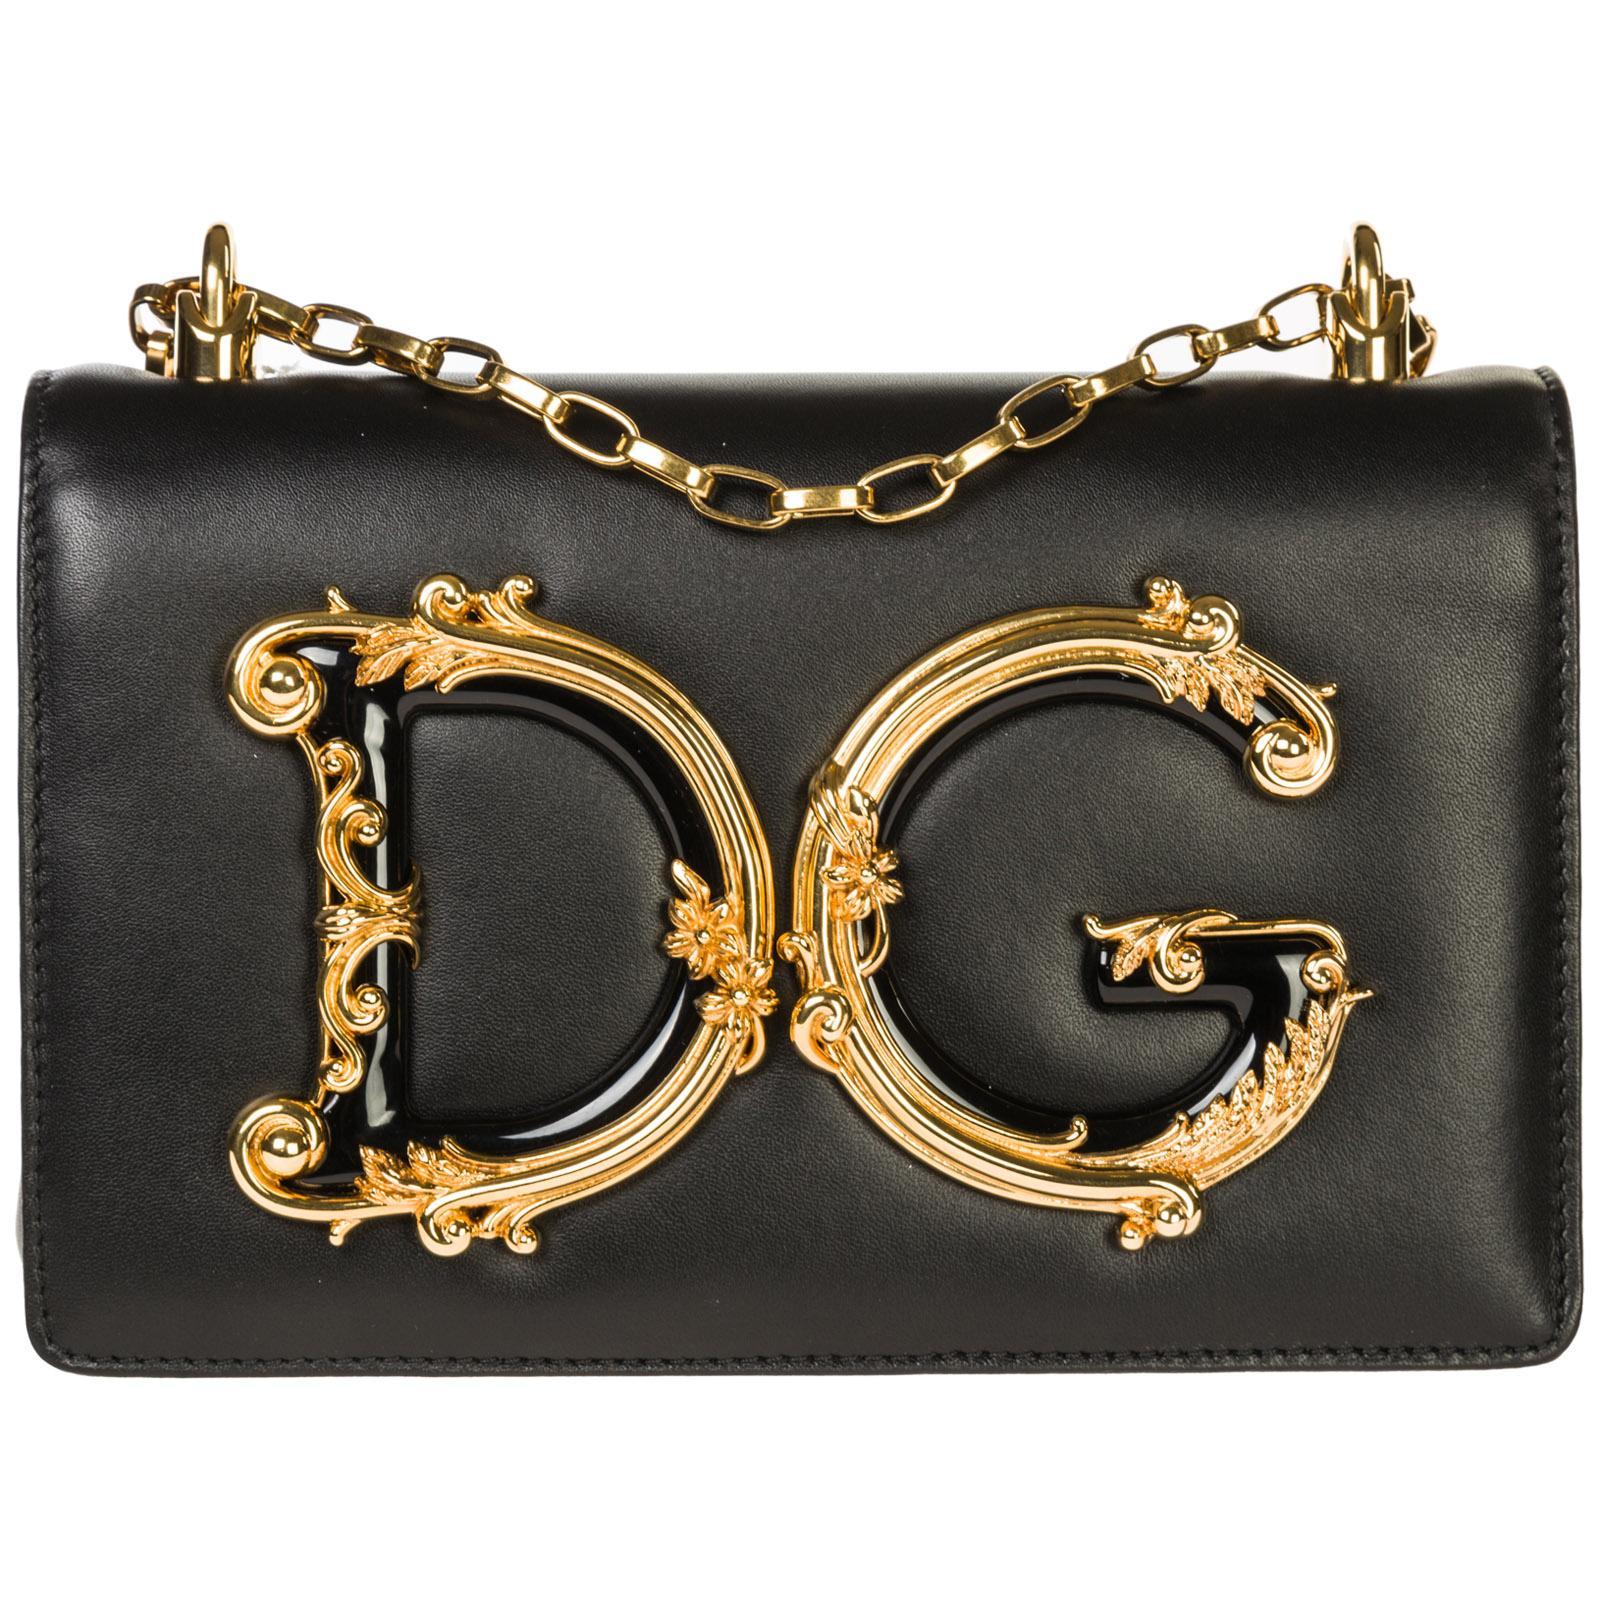 adf99c907985 Lyst - Dolce   Gabbana Leather Shoulder Bag Dg Girls in Black